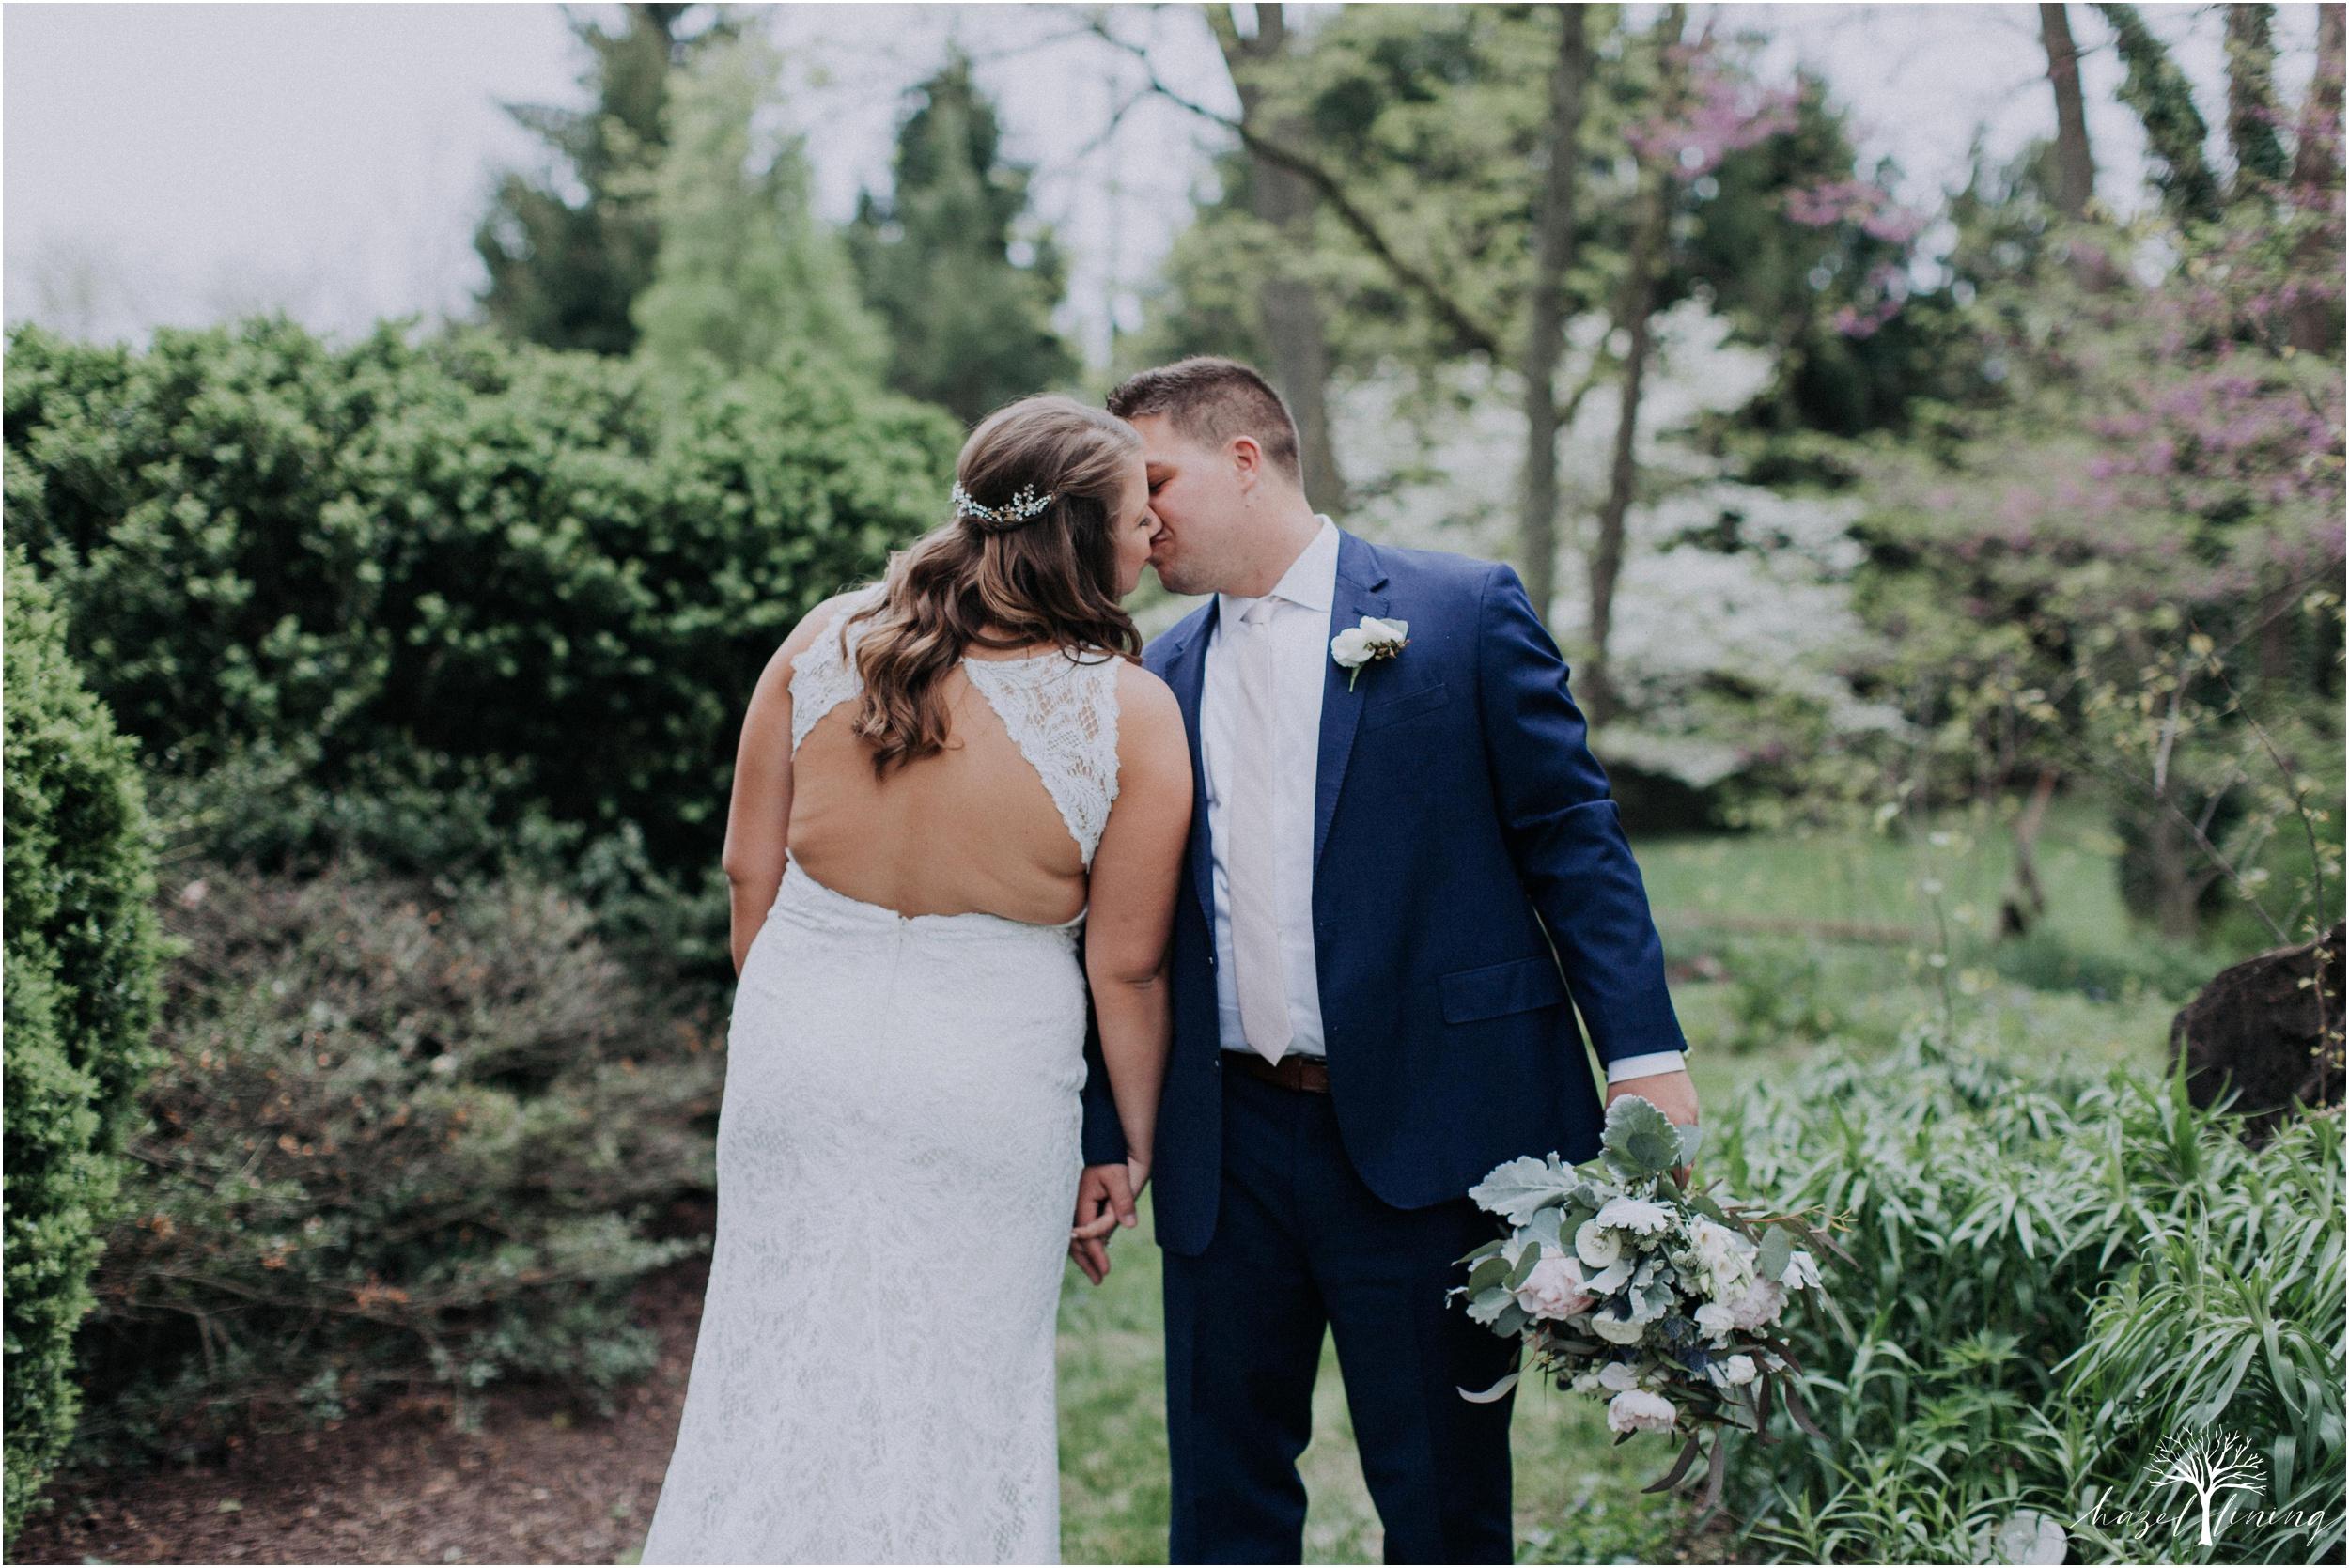 hazel-lining-travel-wedding-elopement-photography-abby-skyler-hunt-the-willis-house-york-pennsylvania-outdoor-estate-wedding_0036.jpg